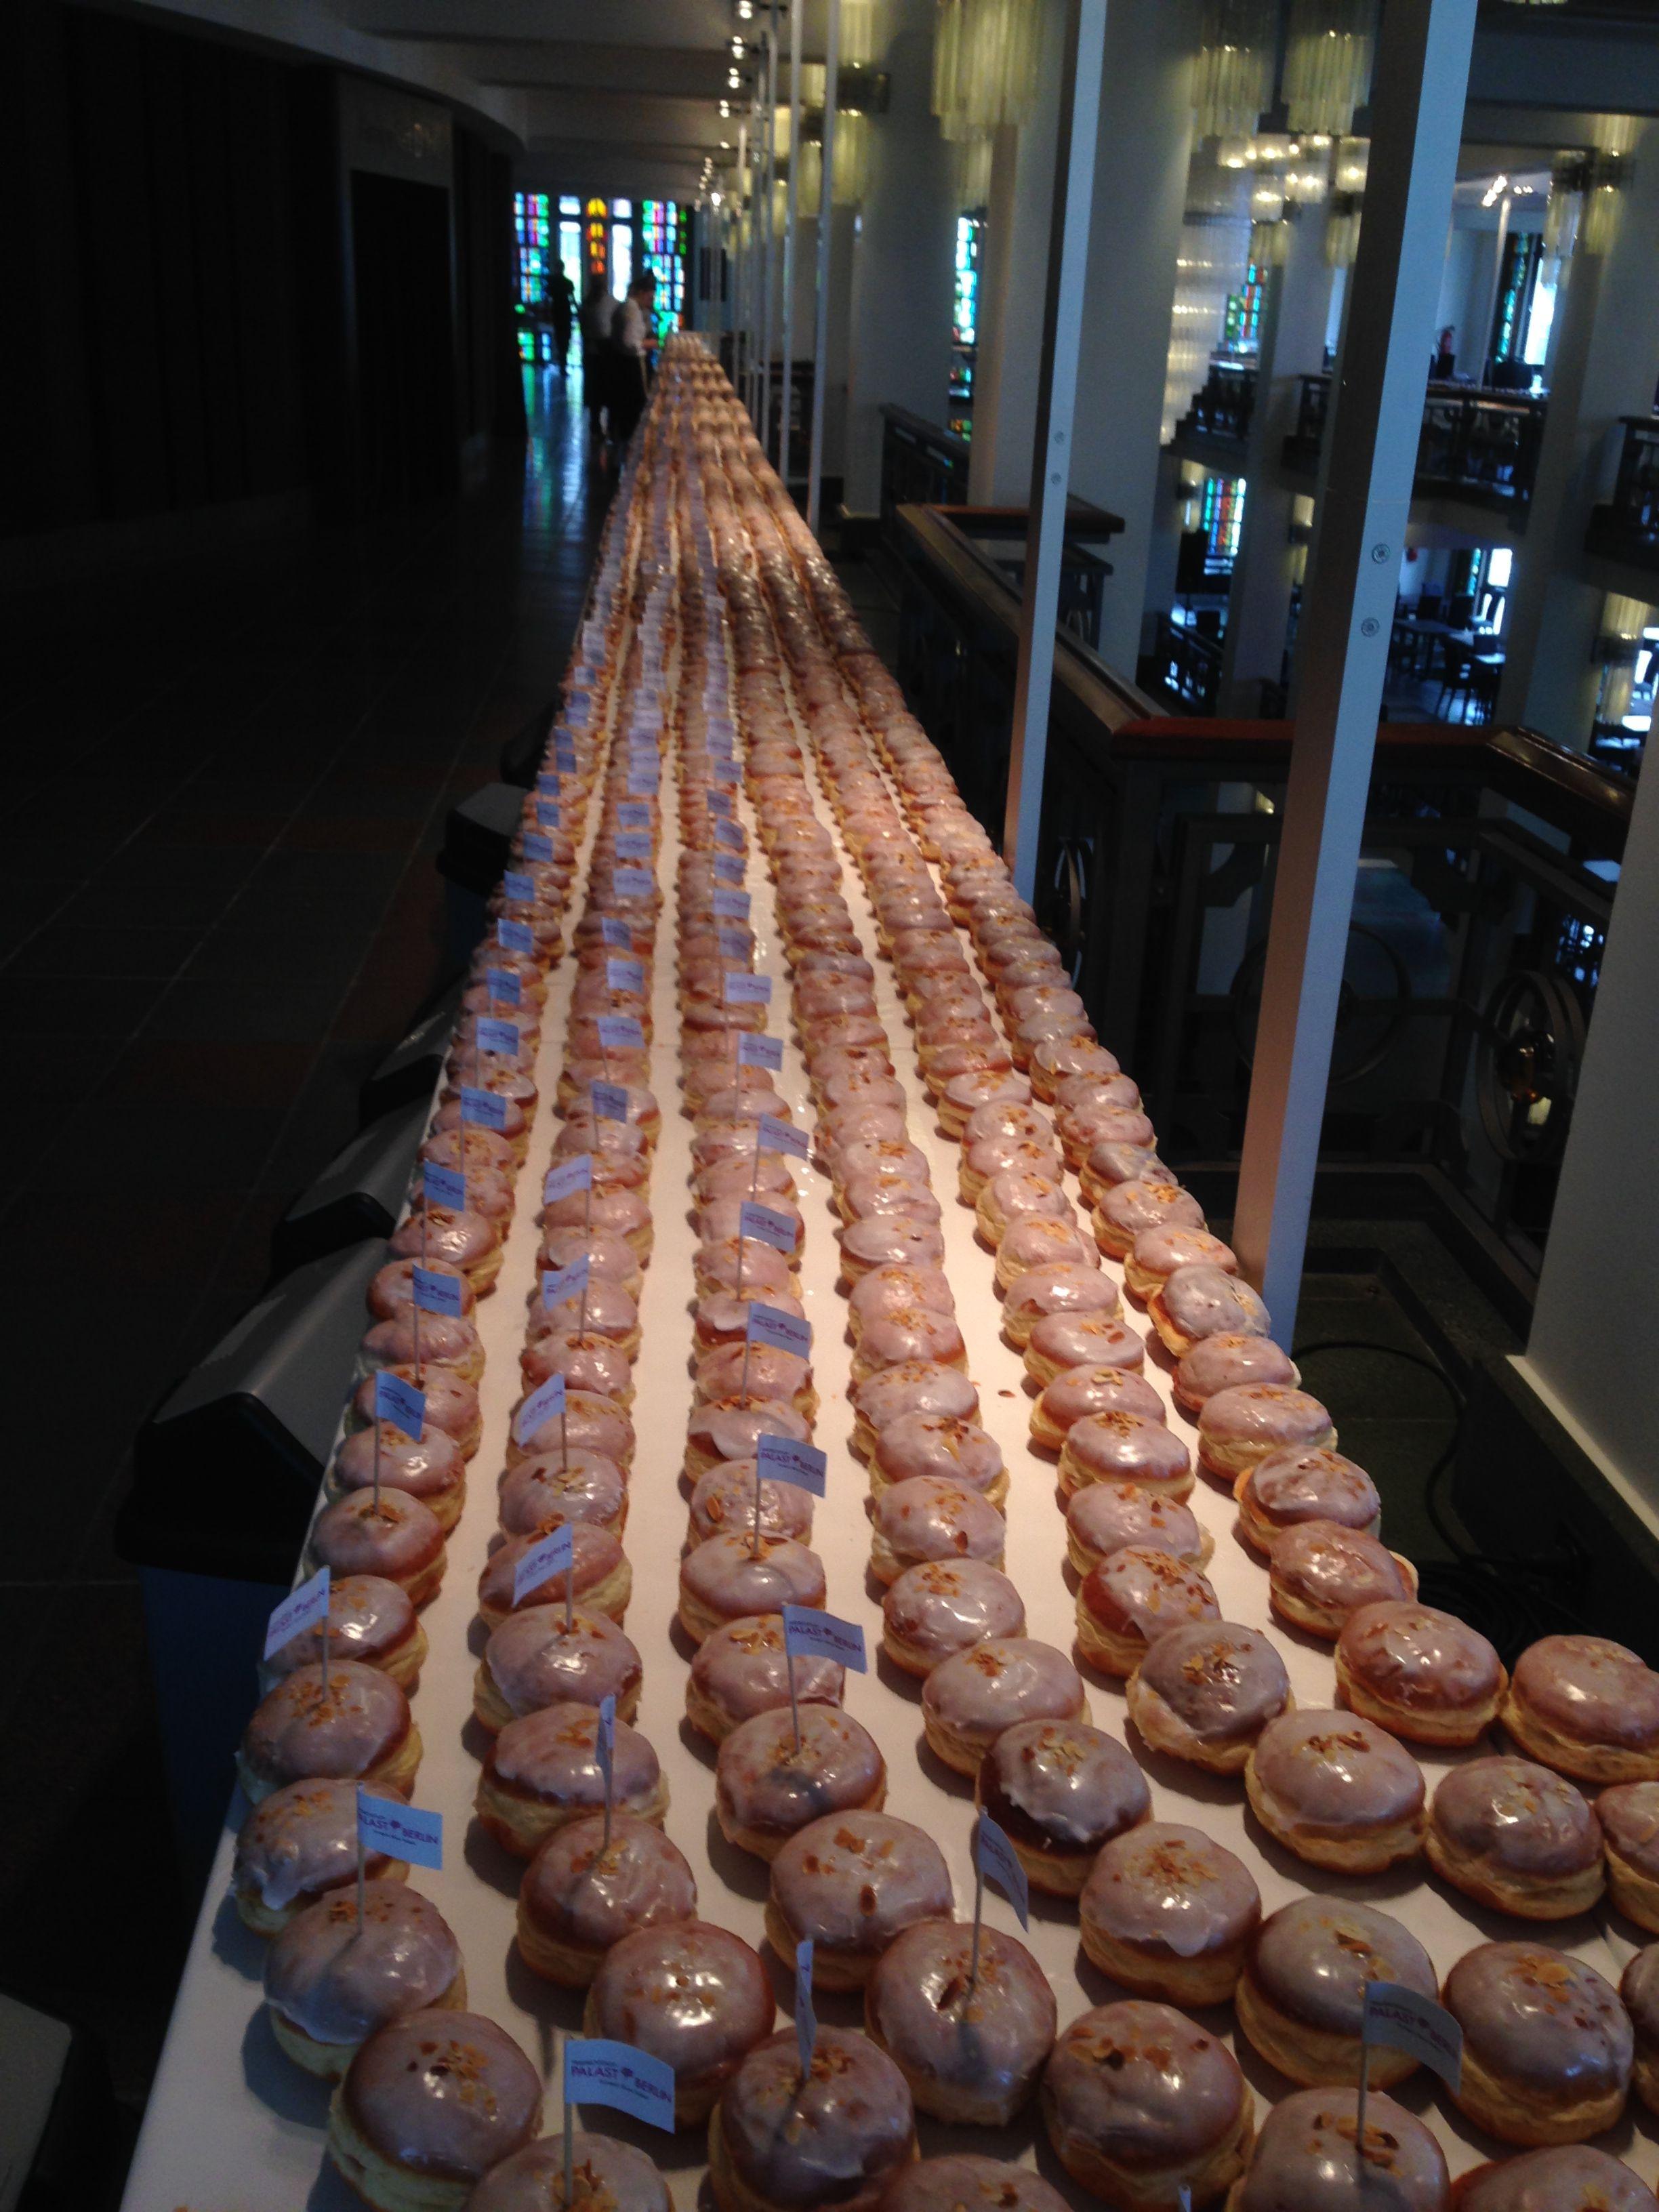 Longest line of doughnuts